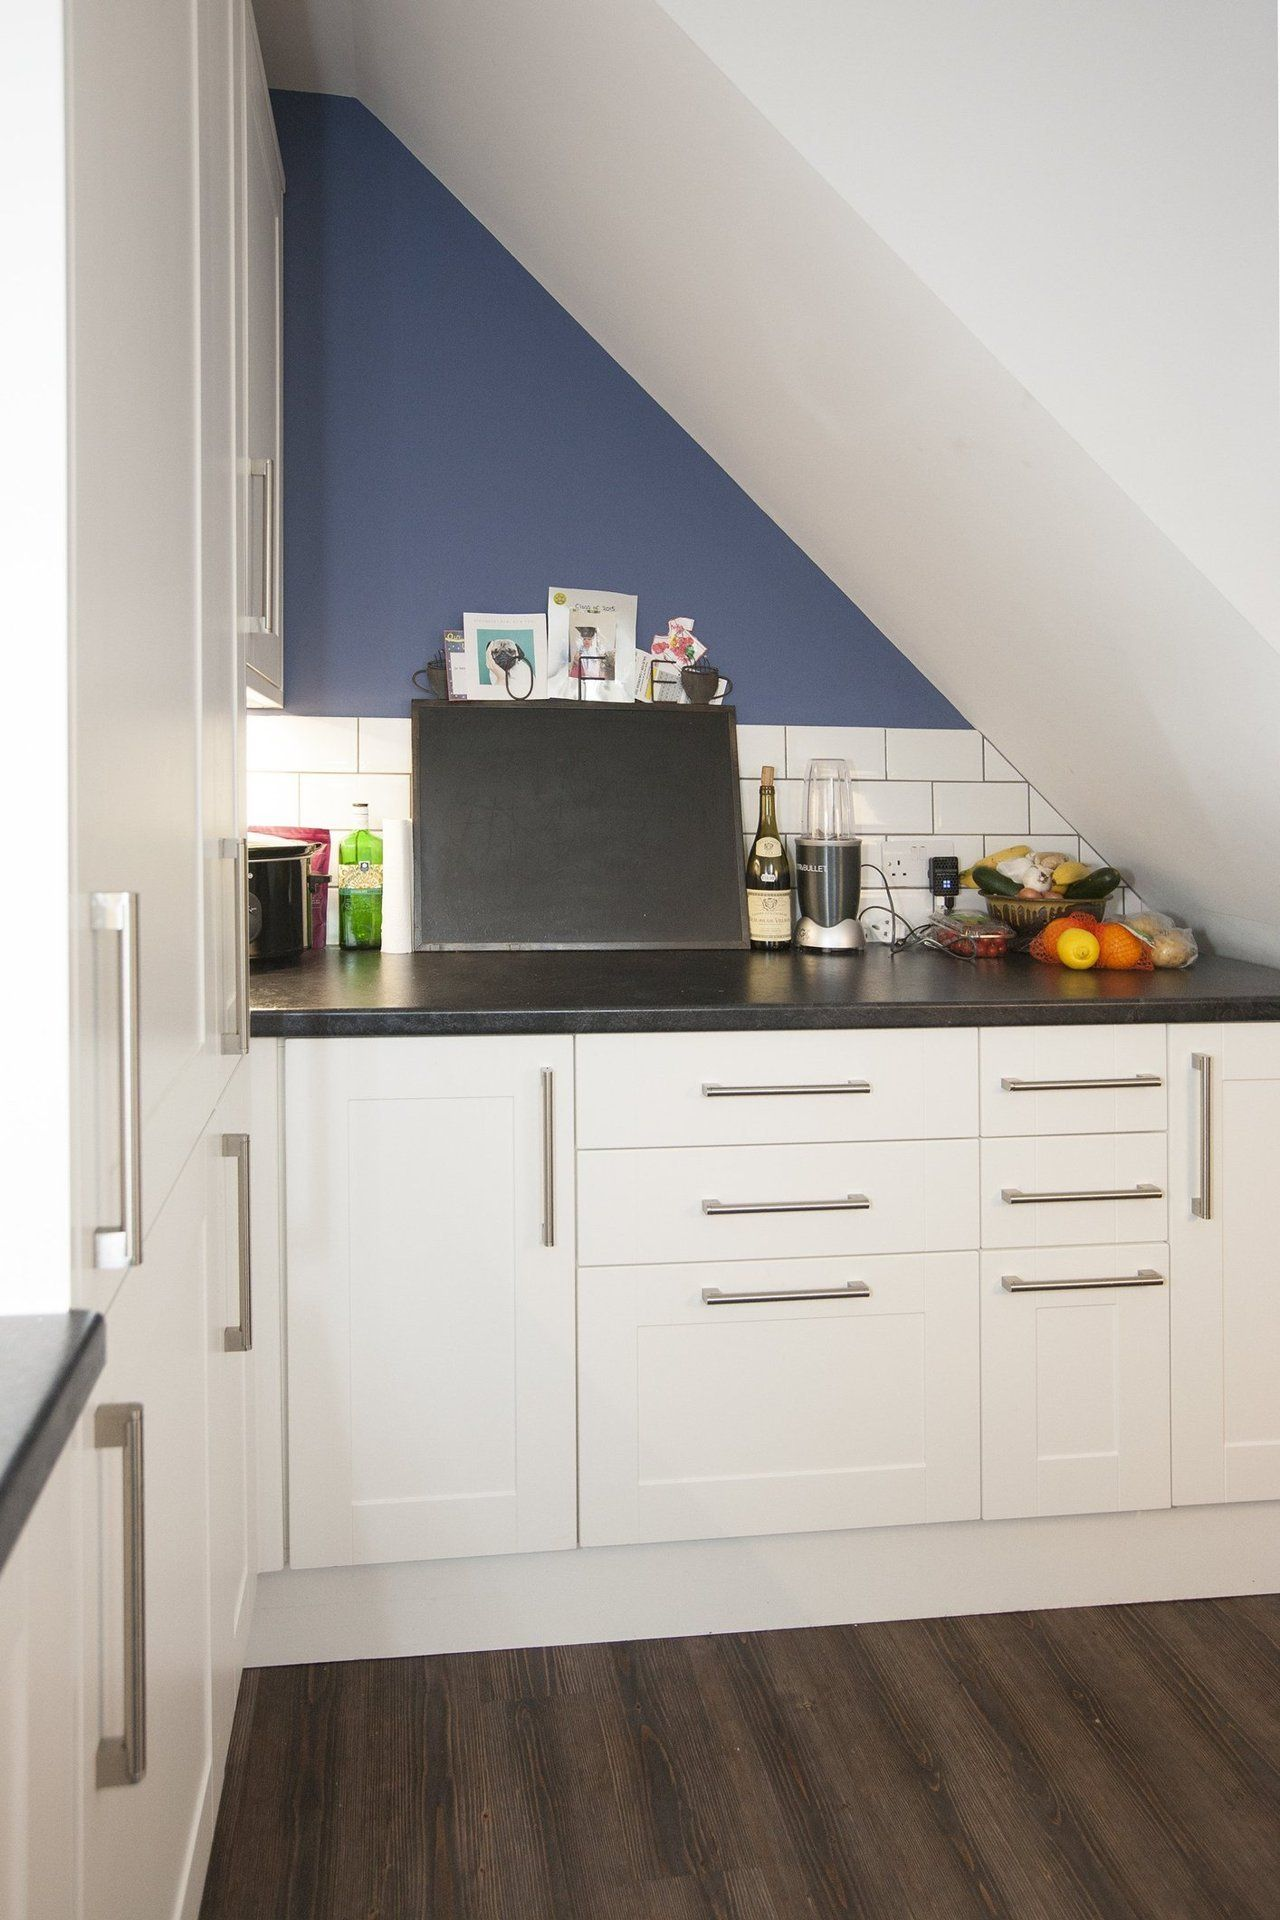 Paul & Katie's Modern Eclectic London Flat Beauteous Kitchen Design For Flats Inspiration Design